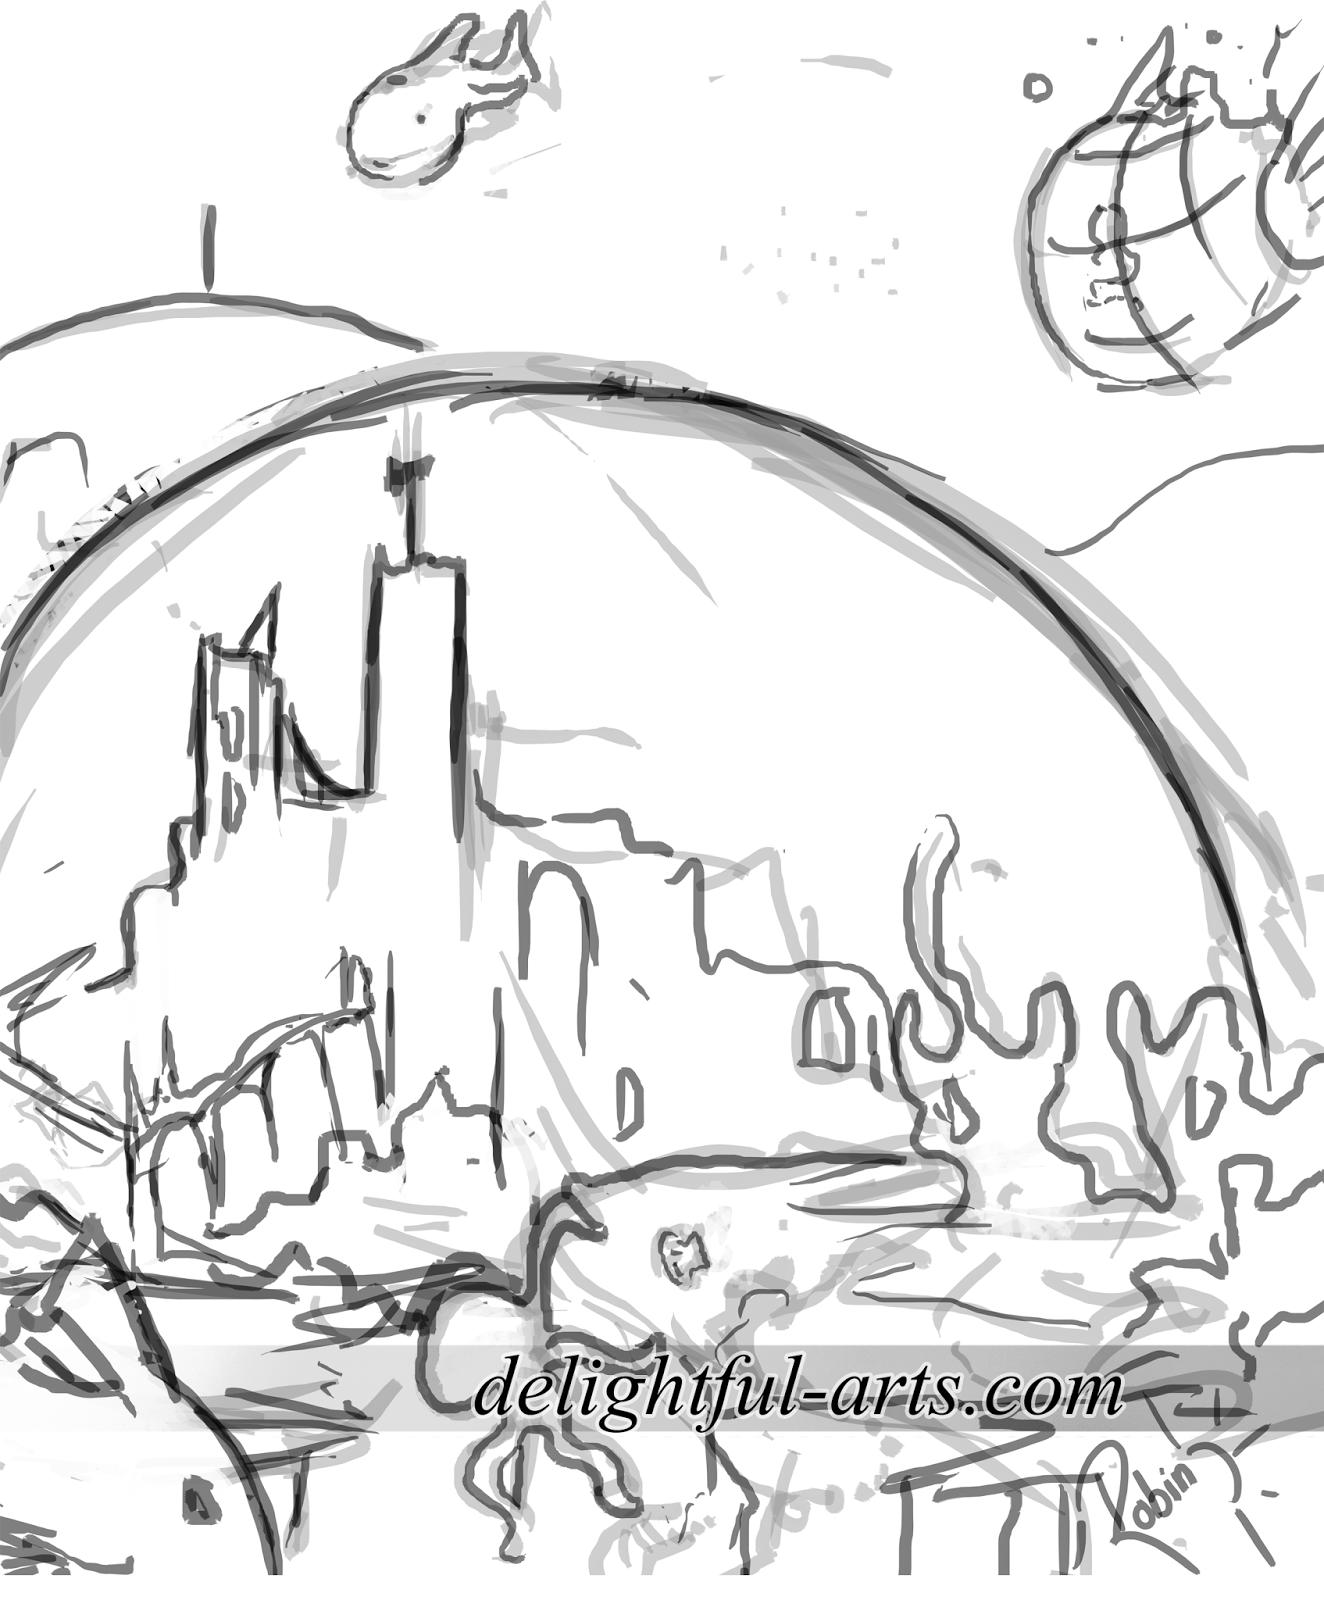 1324x1600 Delightful Arts Underwater City Sketch And Speedart